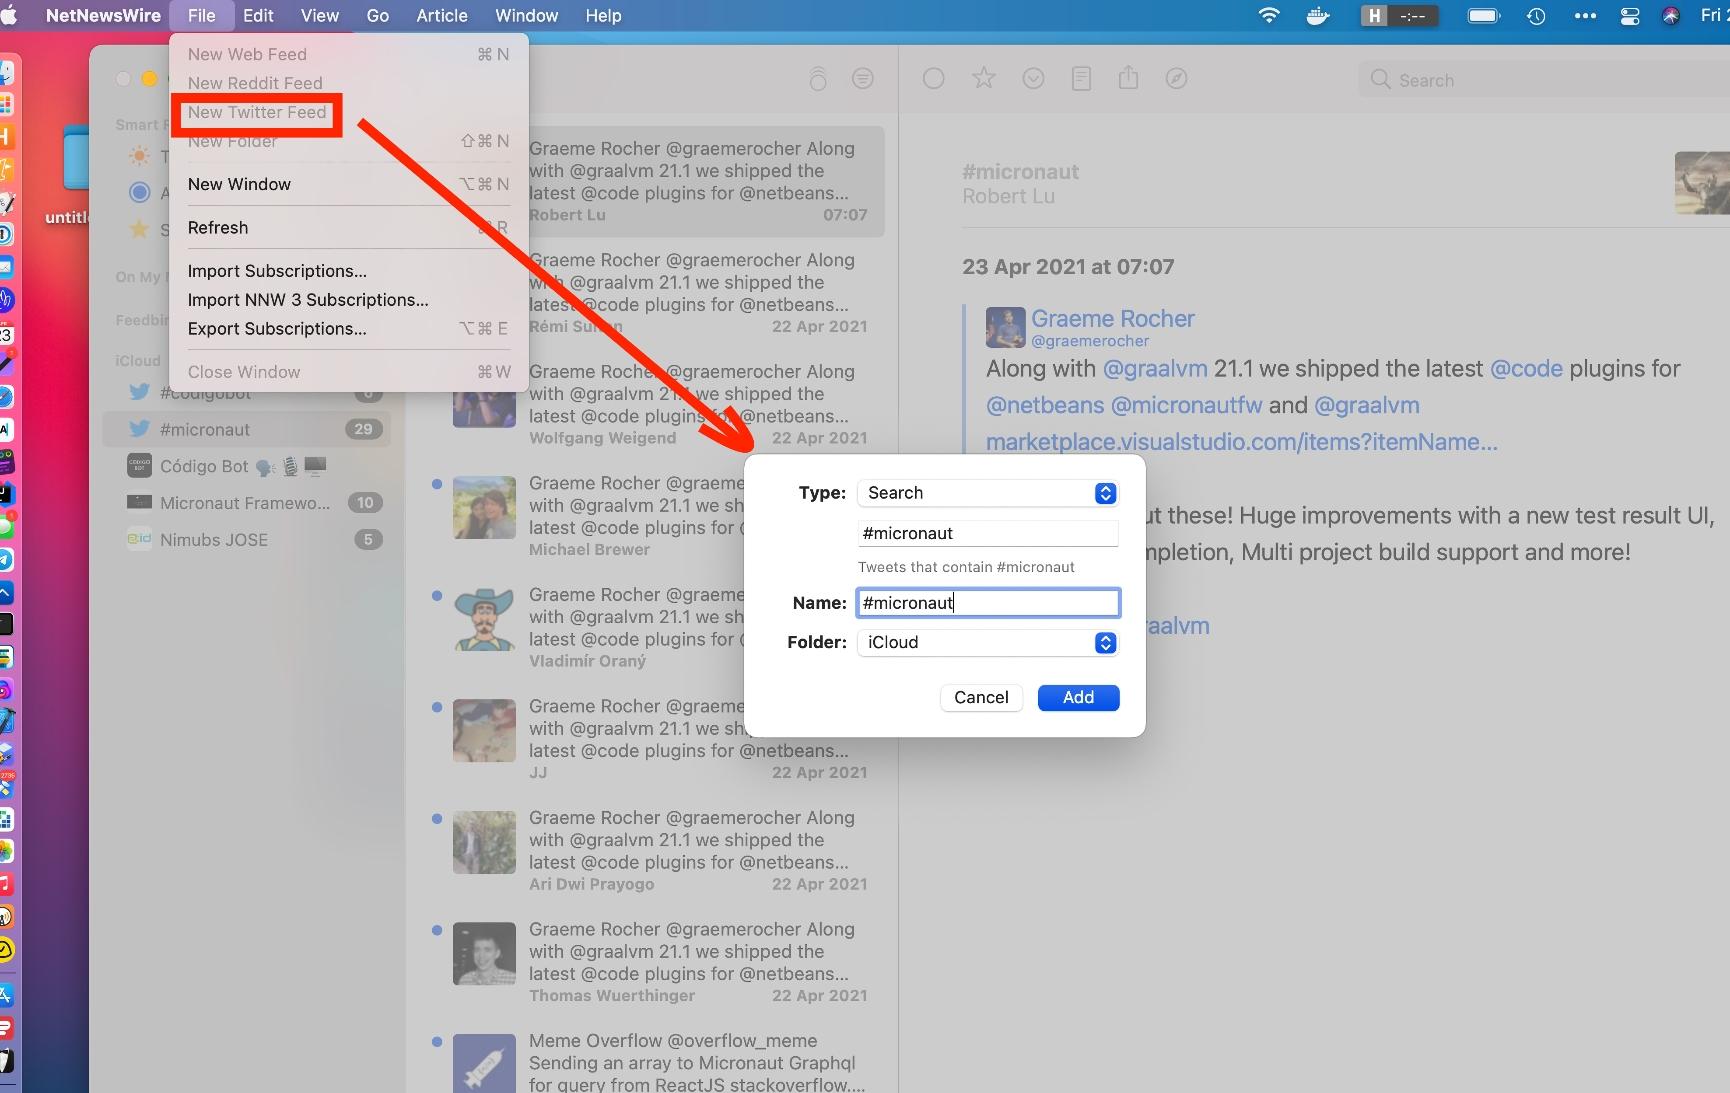 NetNewsWire Twitter Micronaut hashtag subscription